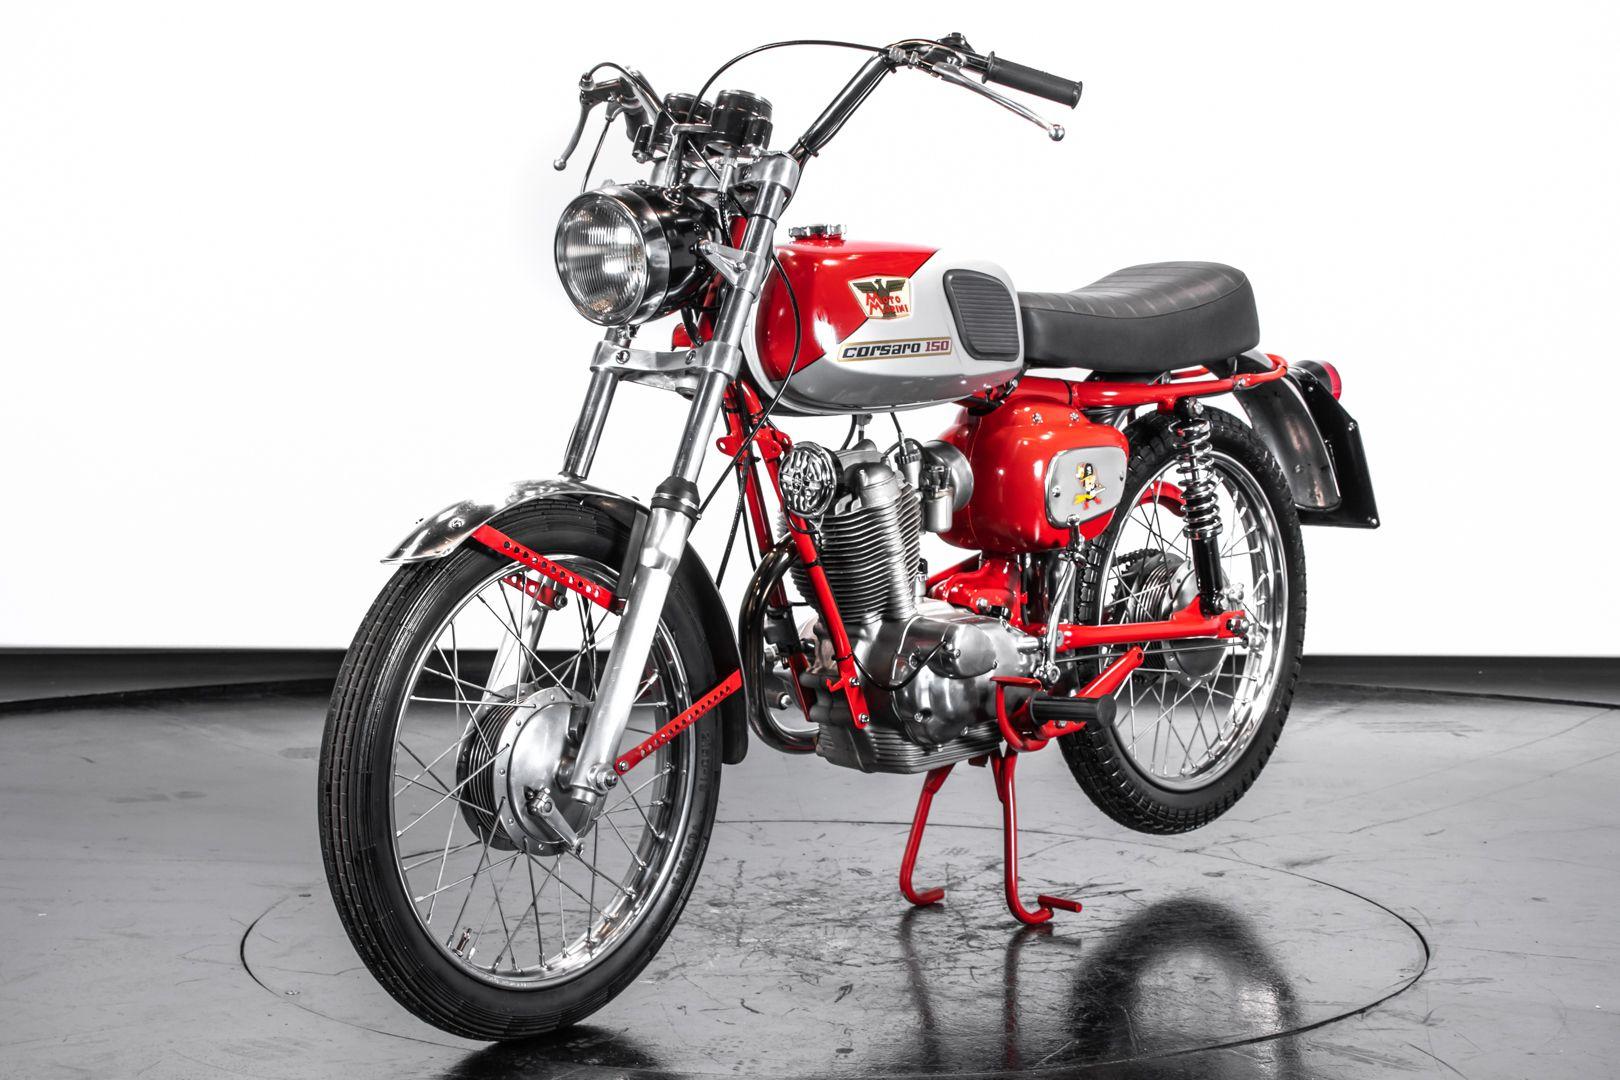 1971 Moto Morini Corsaro SS 150 77723